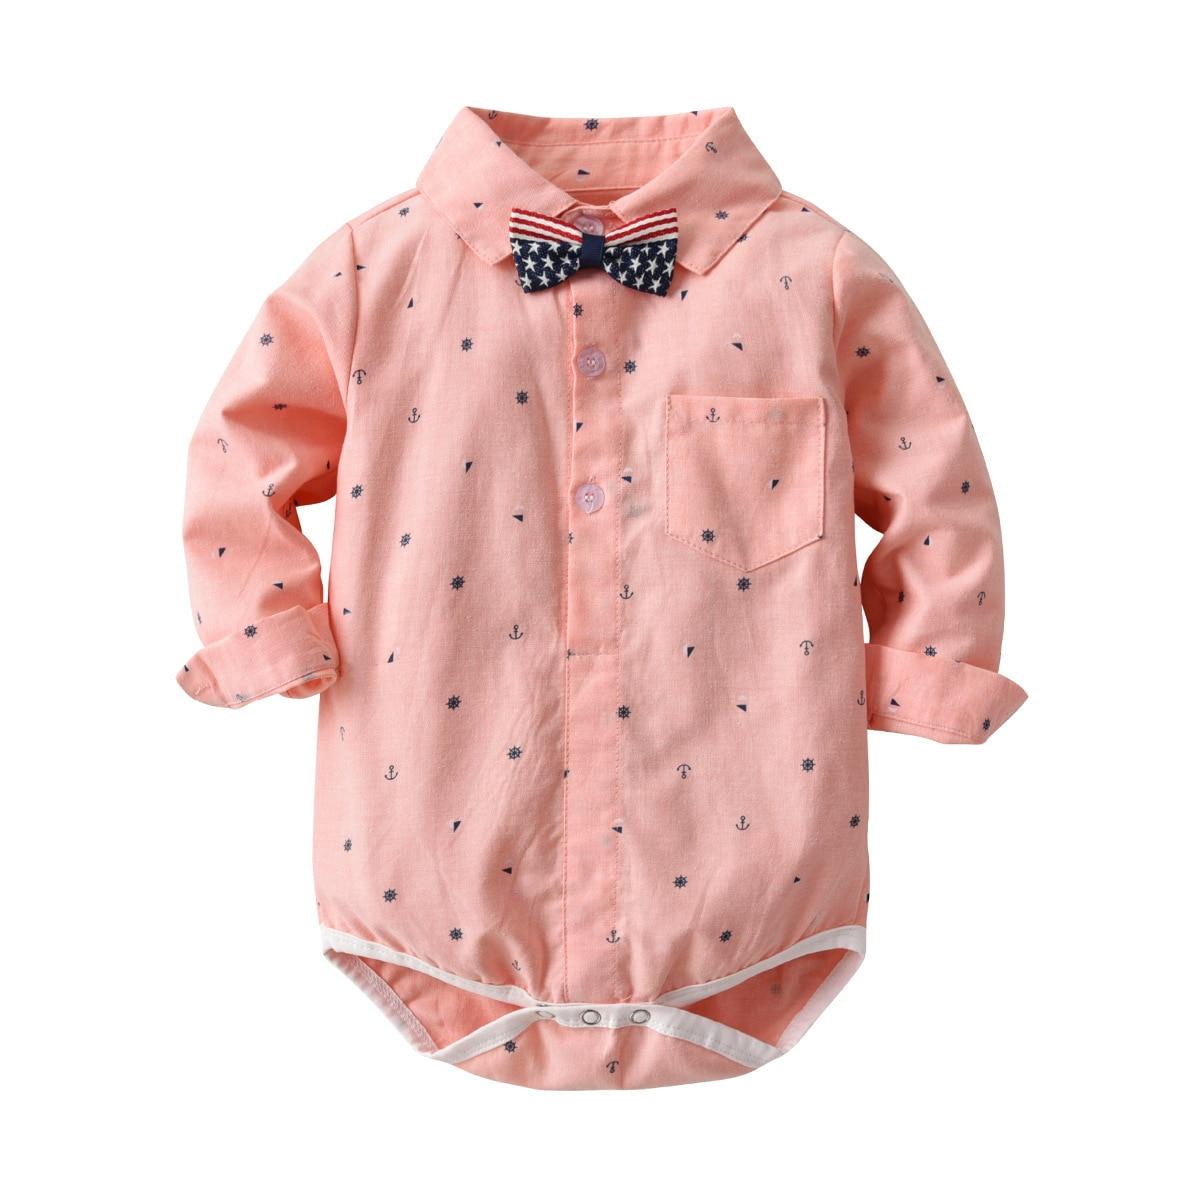 HI&JUBER 2019 New Infant Newborn kids Baby Boy Clothes Long Sleeve Shirt Style Romper Kids Jumpsuit Clothing